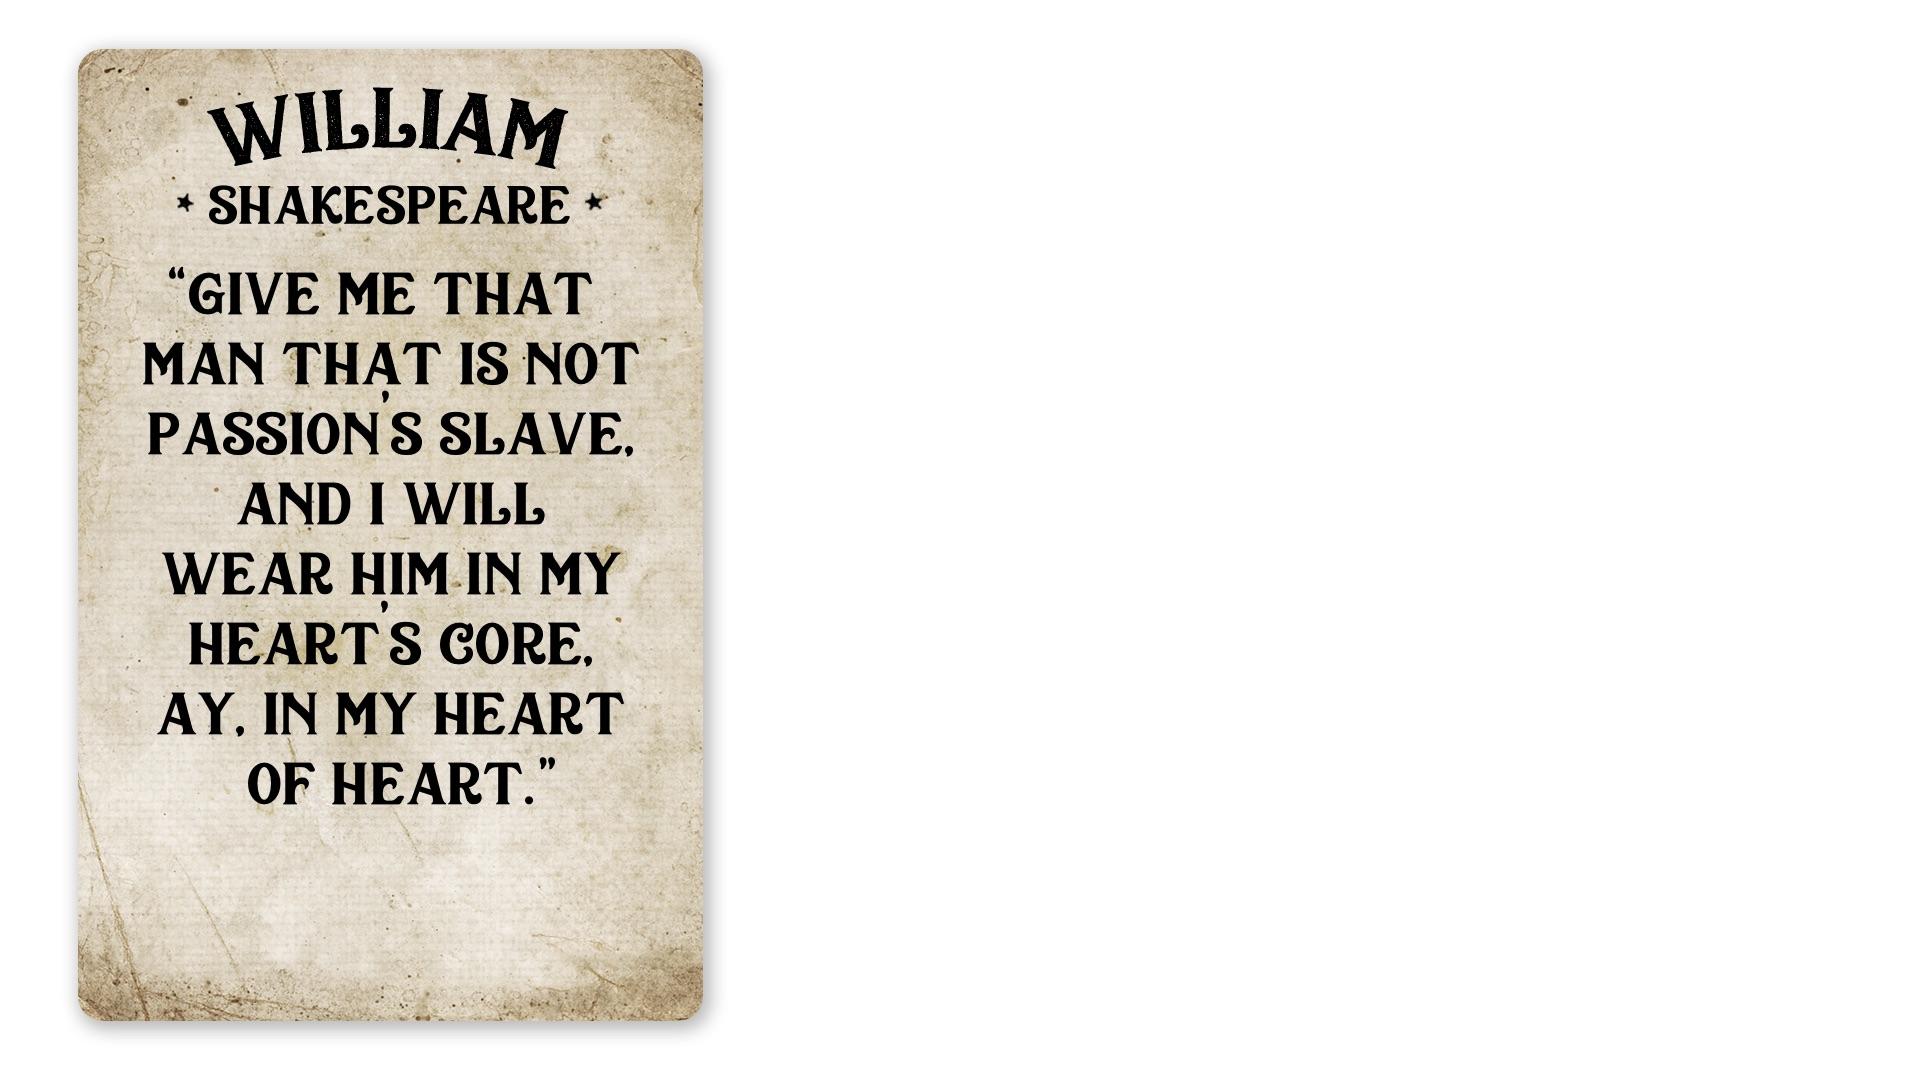 15 - William Shakespeare quote (PNG)